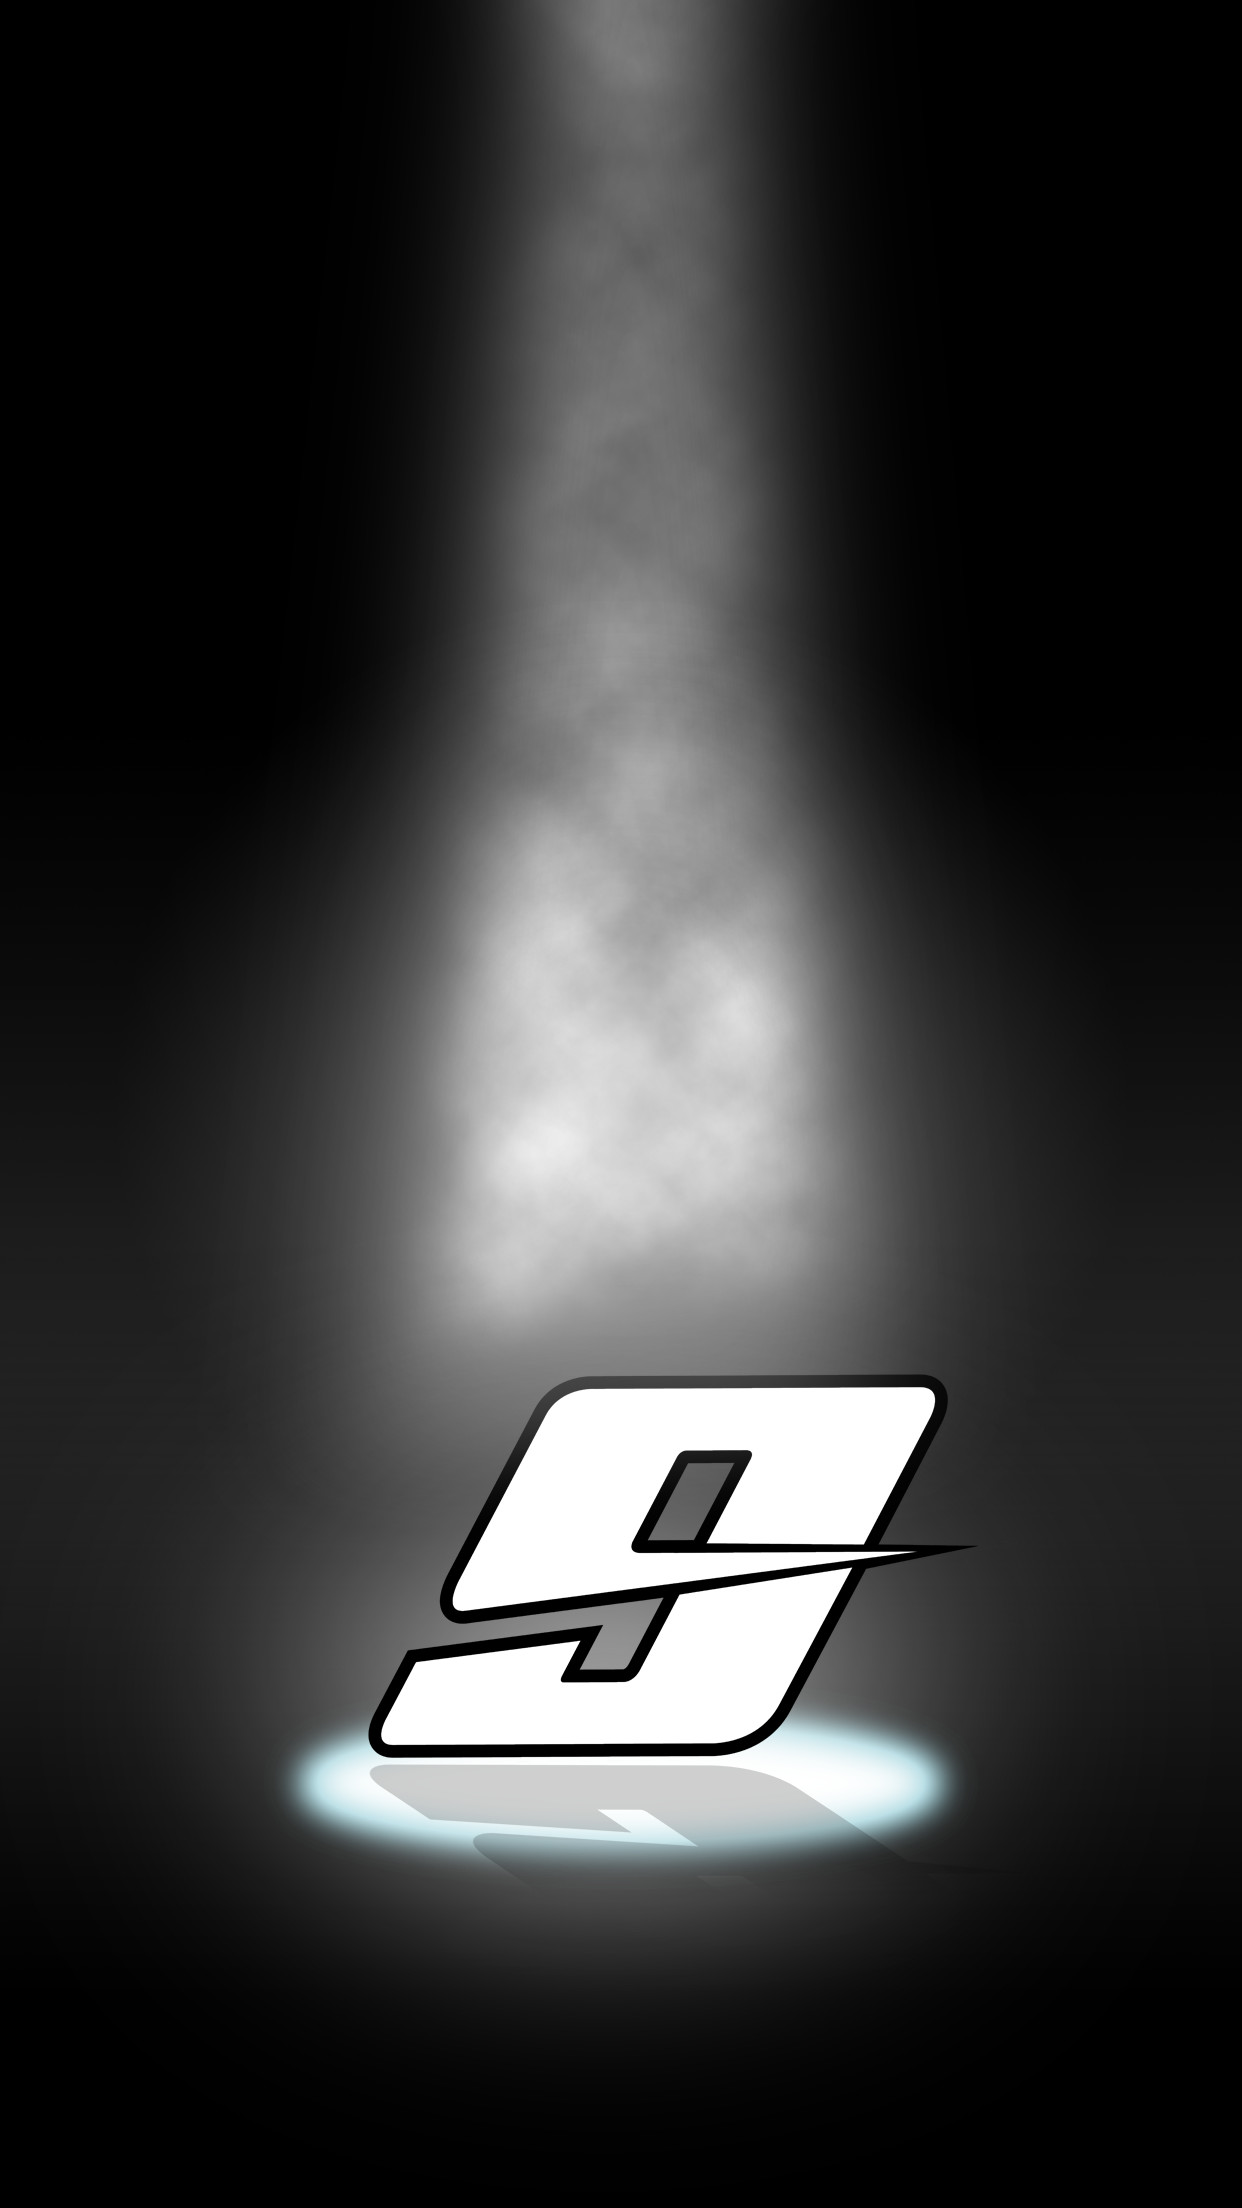 Res: 1242x2208, P H O N E W A L L P A P E R S | Kasey Kahne Racing